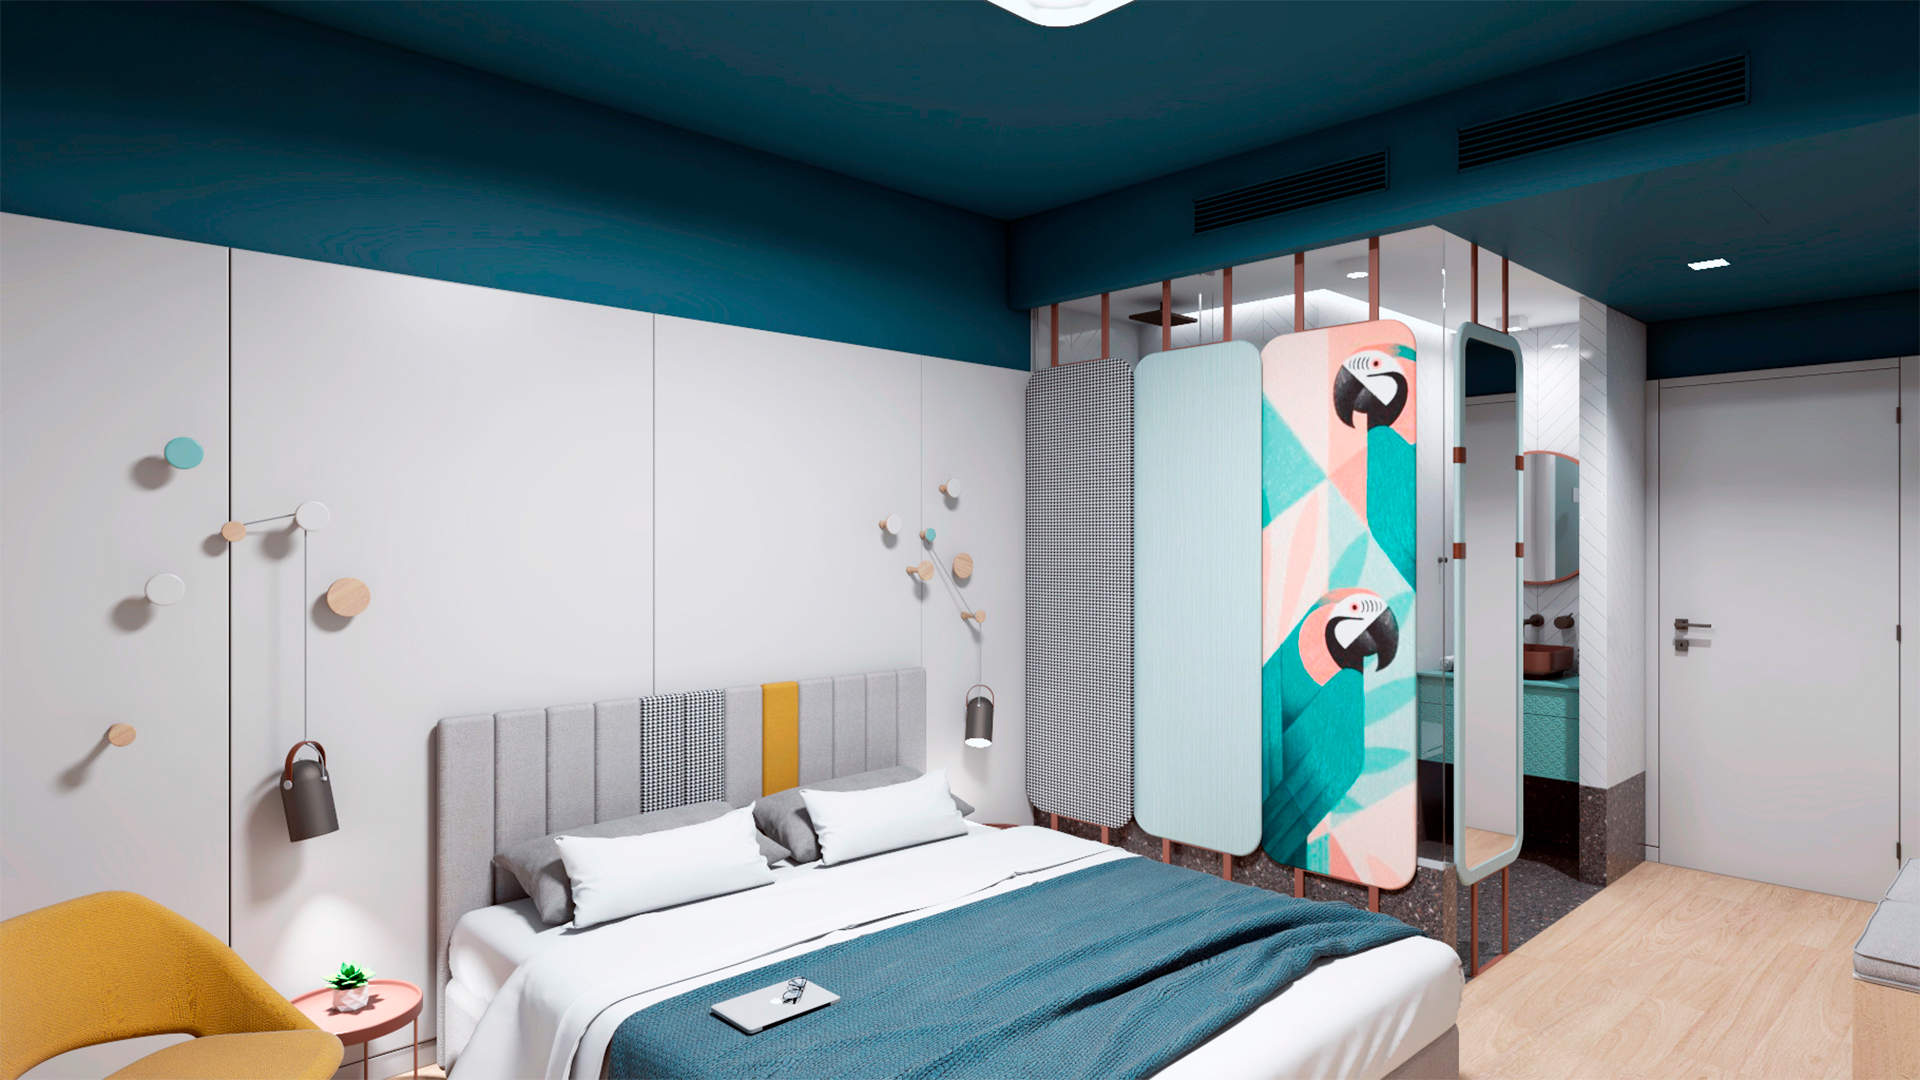 City hotel room, interior design, united beds and bathroom. Δωμάτιο αστικού ξενοδοχείου, ενωμένα κρεβάτια, μπάνιο.